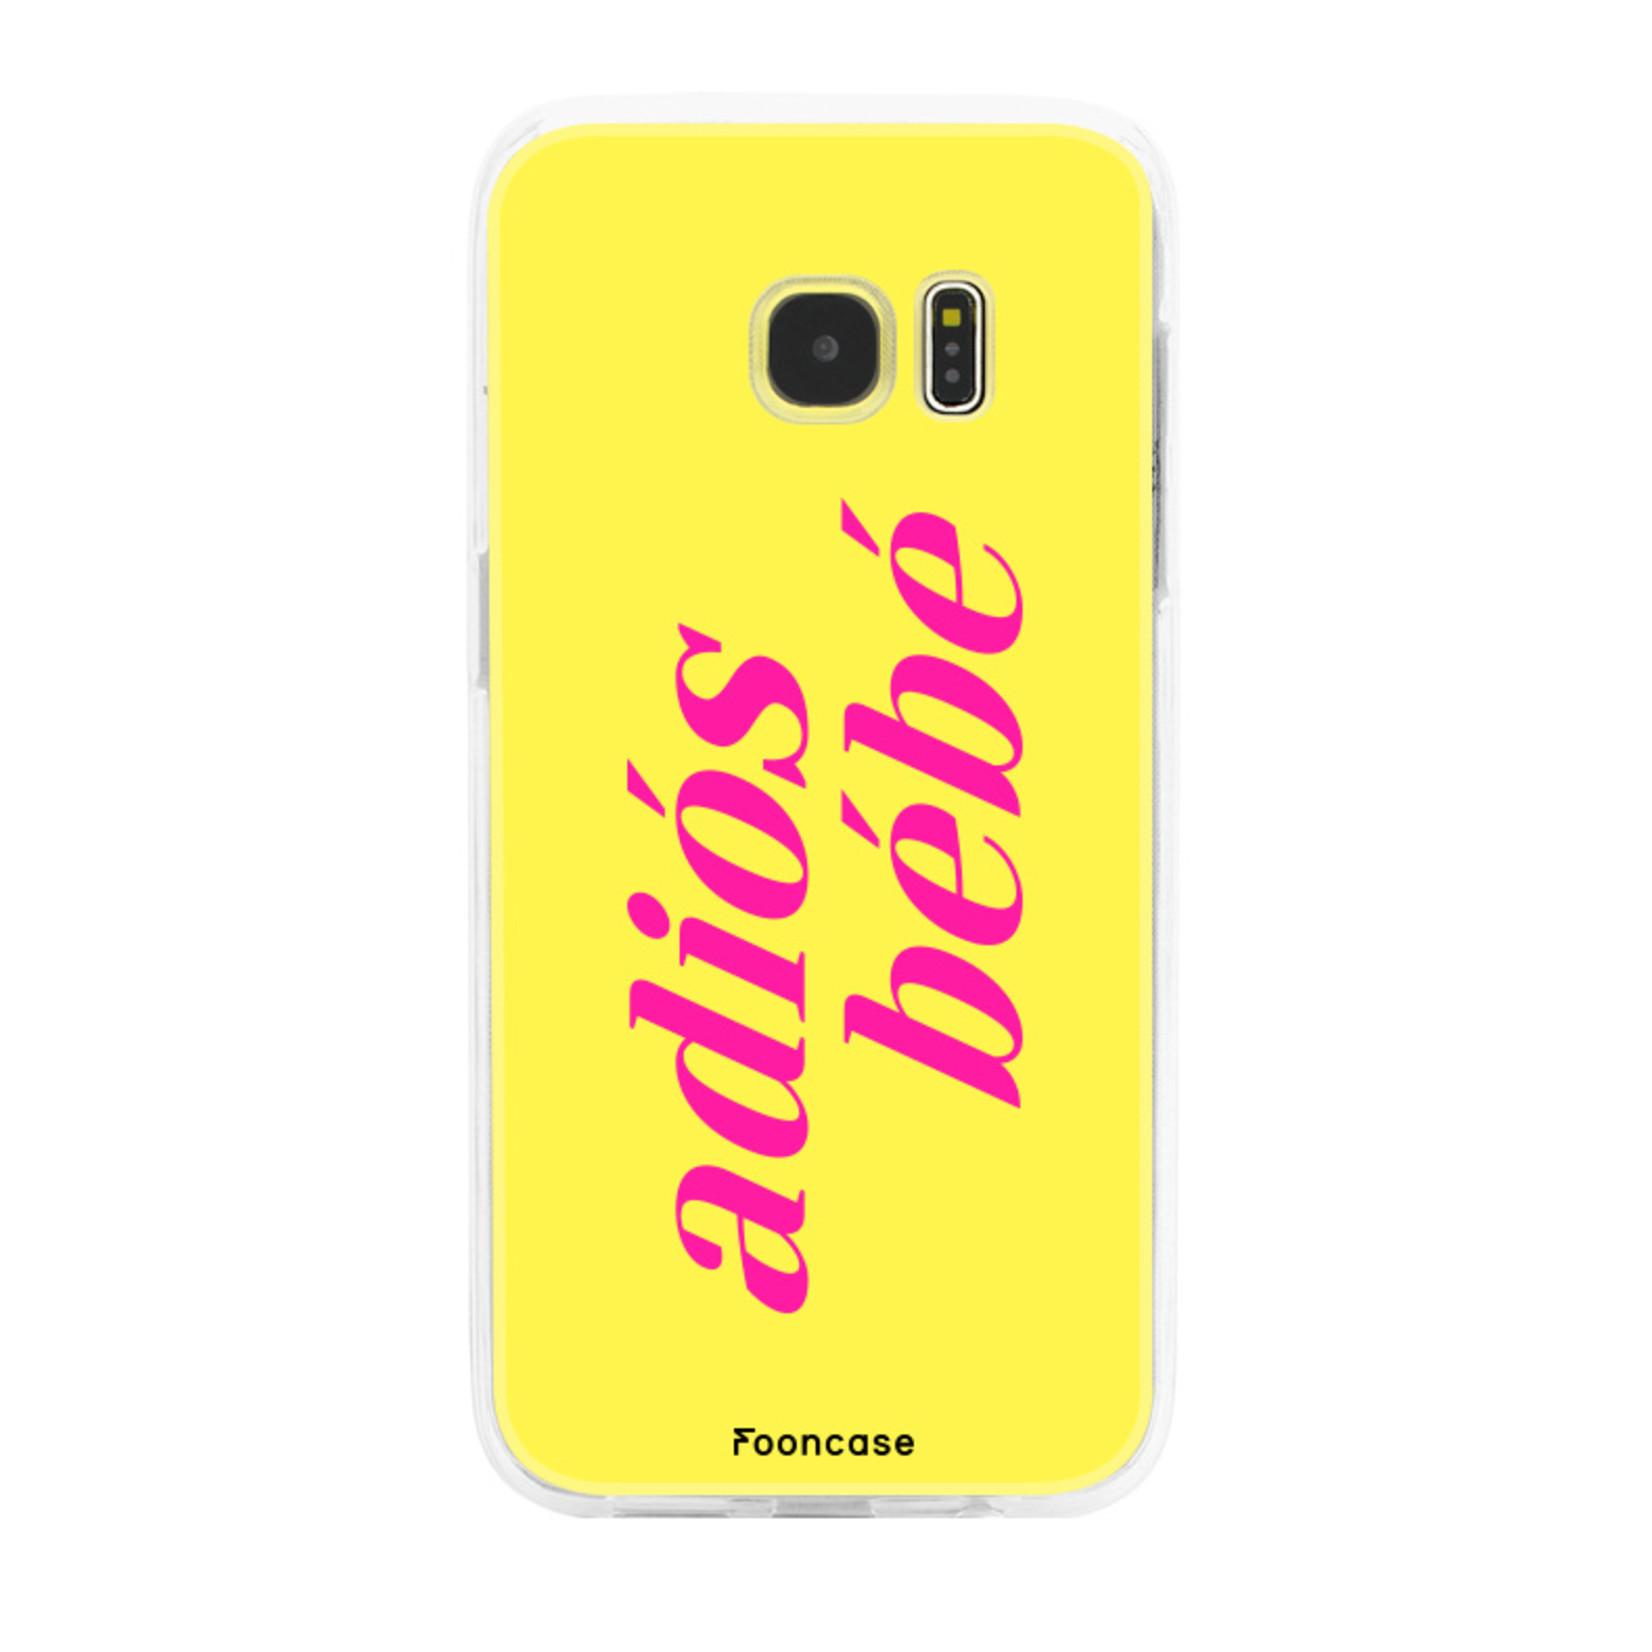 FOONCASE Samsung Galaxy S7 Edge Handyhülle - Adiós Bébé ☀